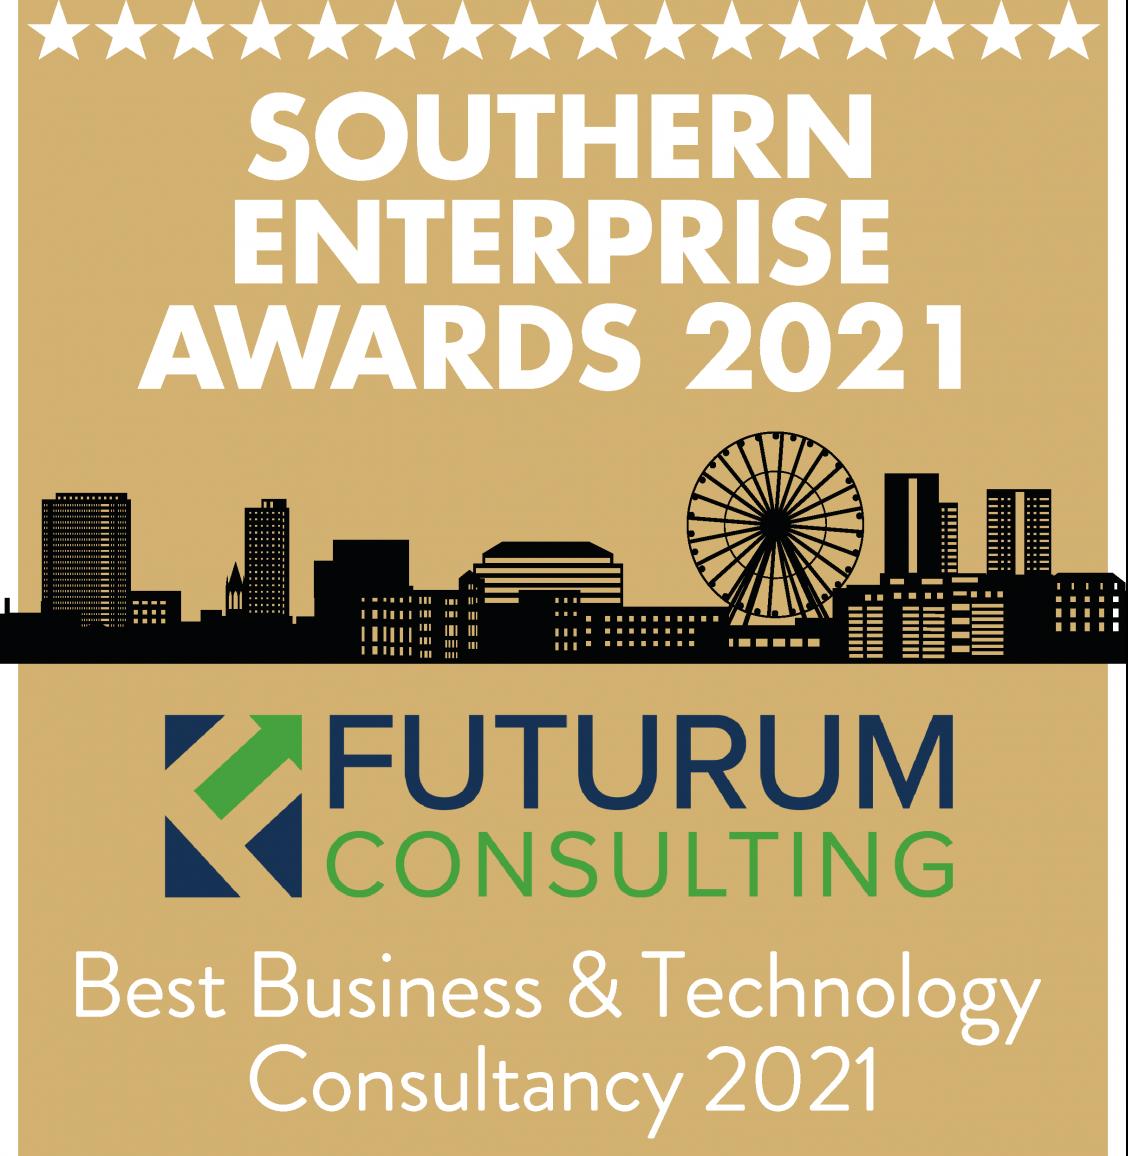 Southern-Enterprise-Awards-2021